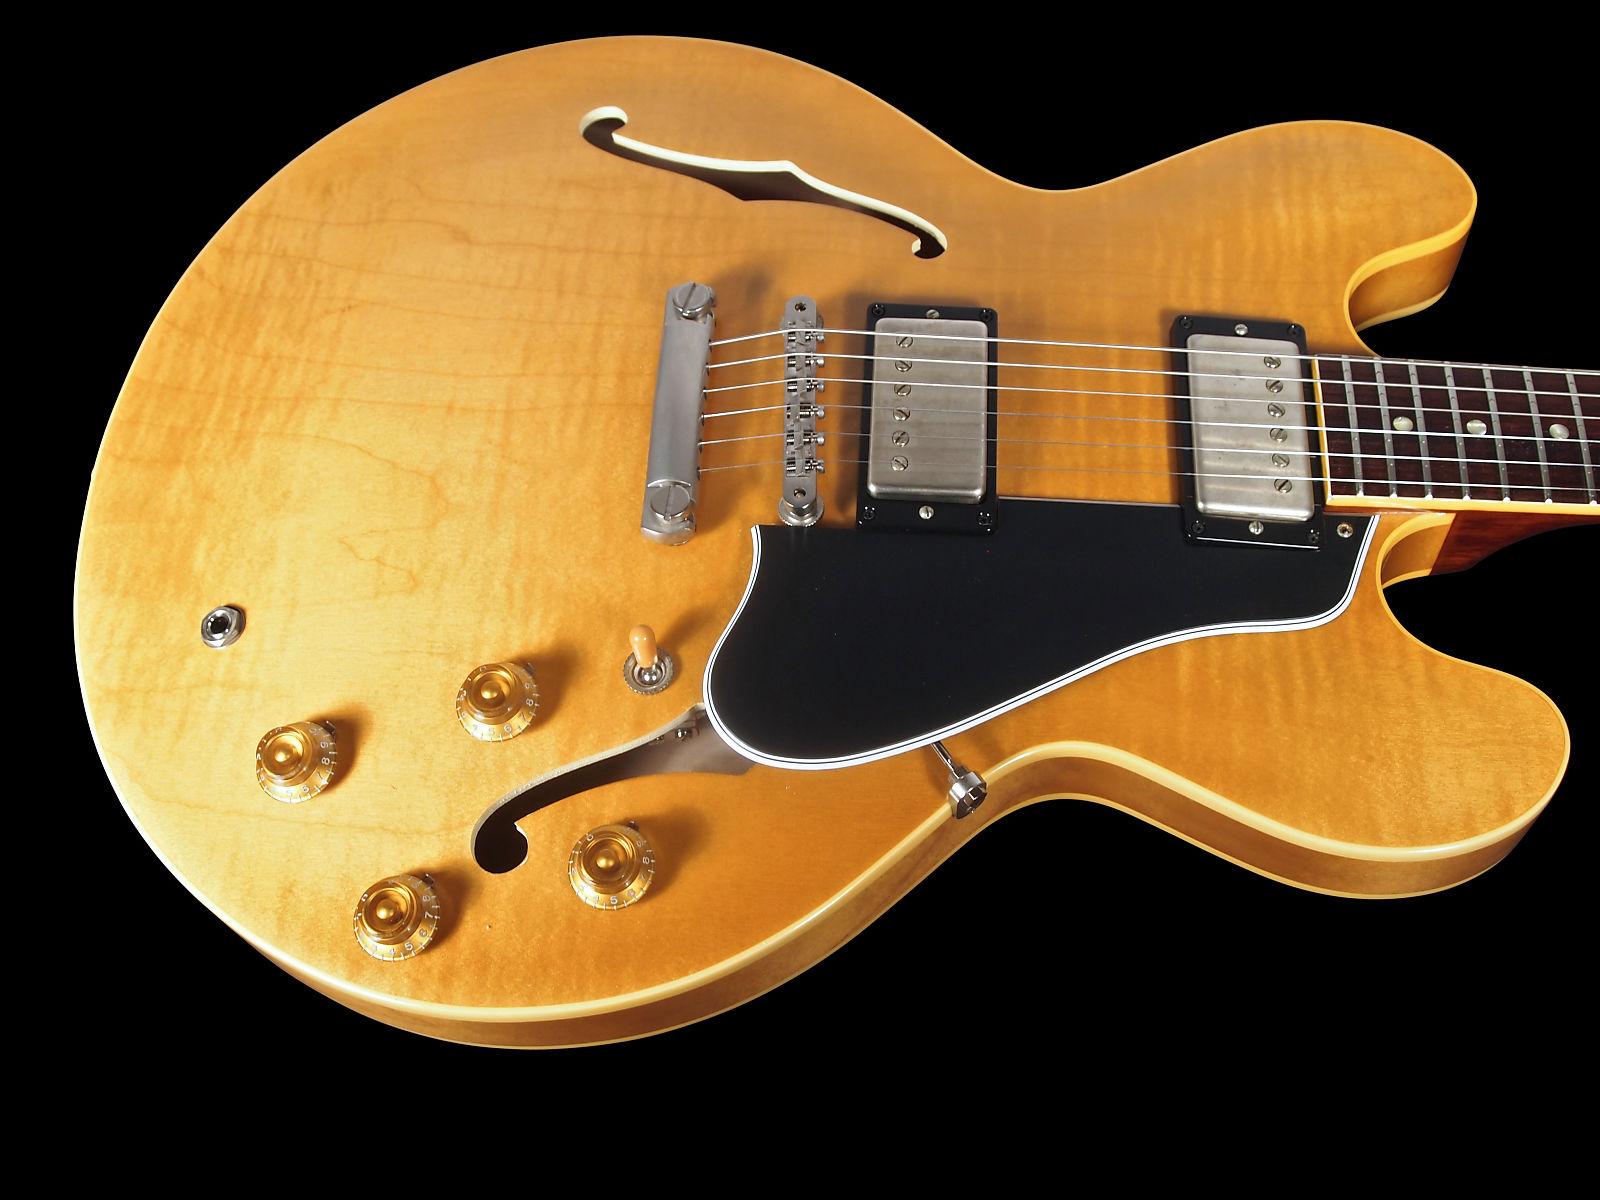 2017 Gibson ES 335 TD 1959 Memphis Custom Shop Dot 59 ES335 Reissue Vintage Natural